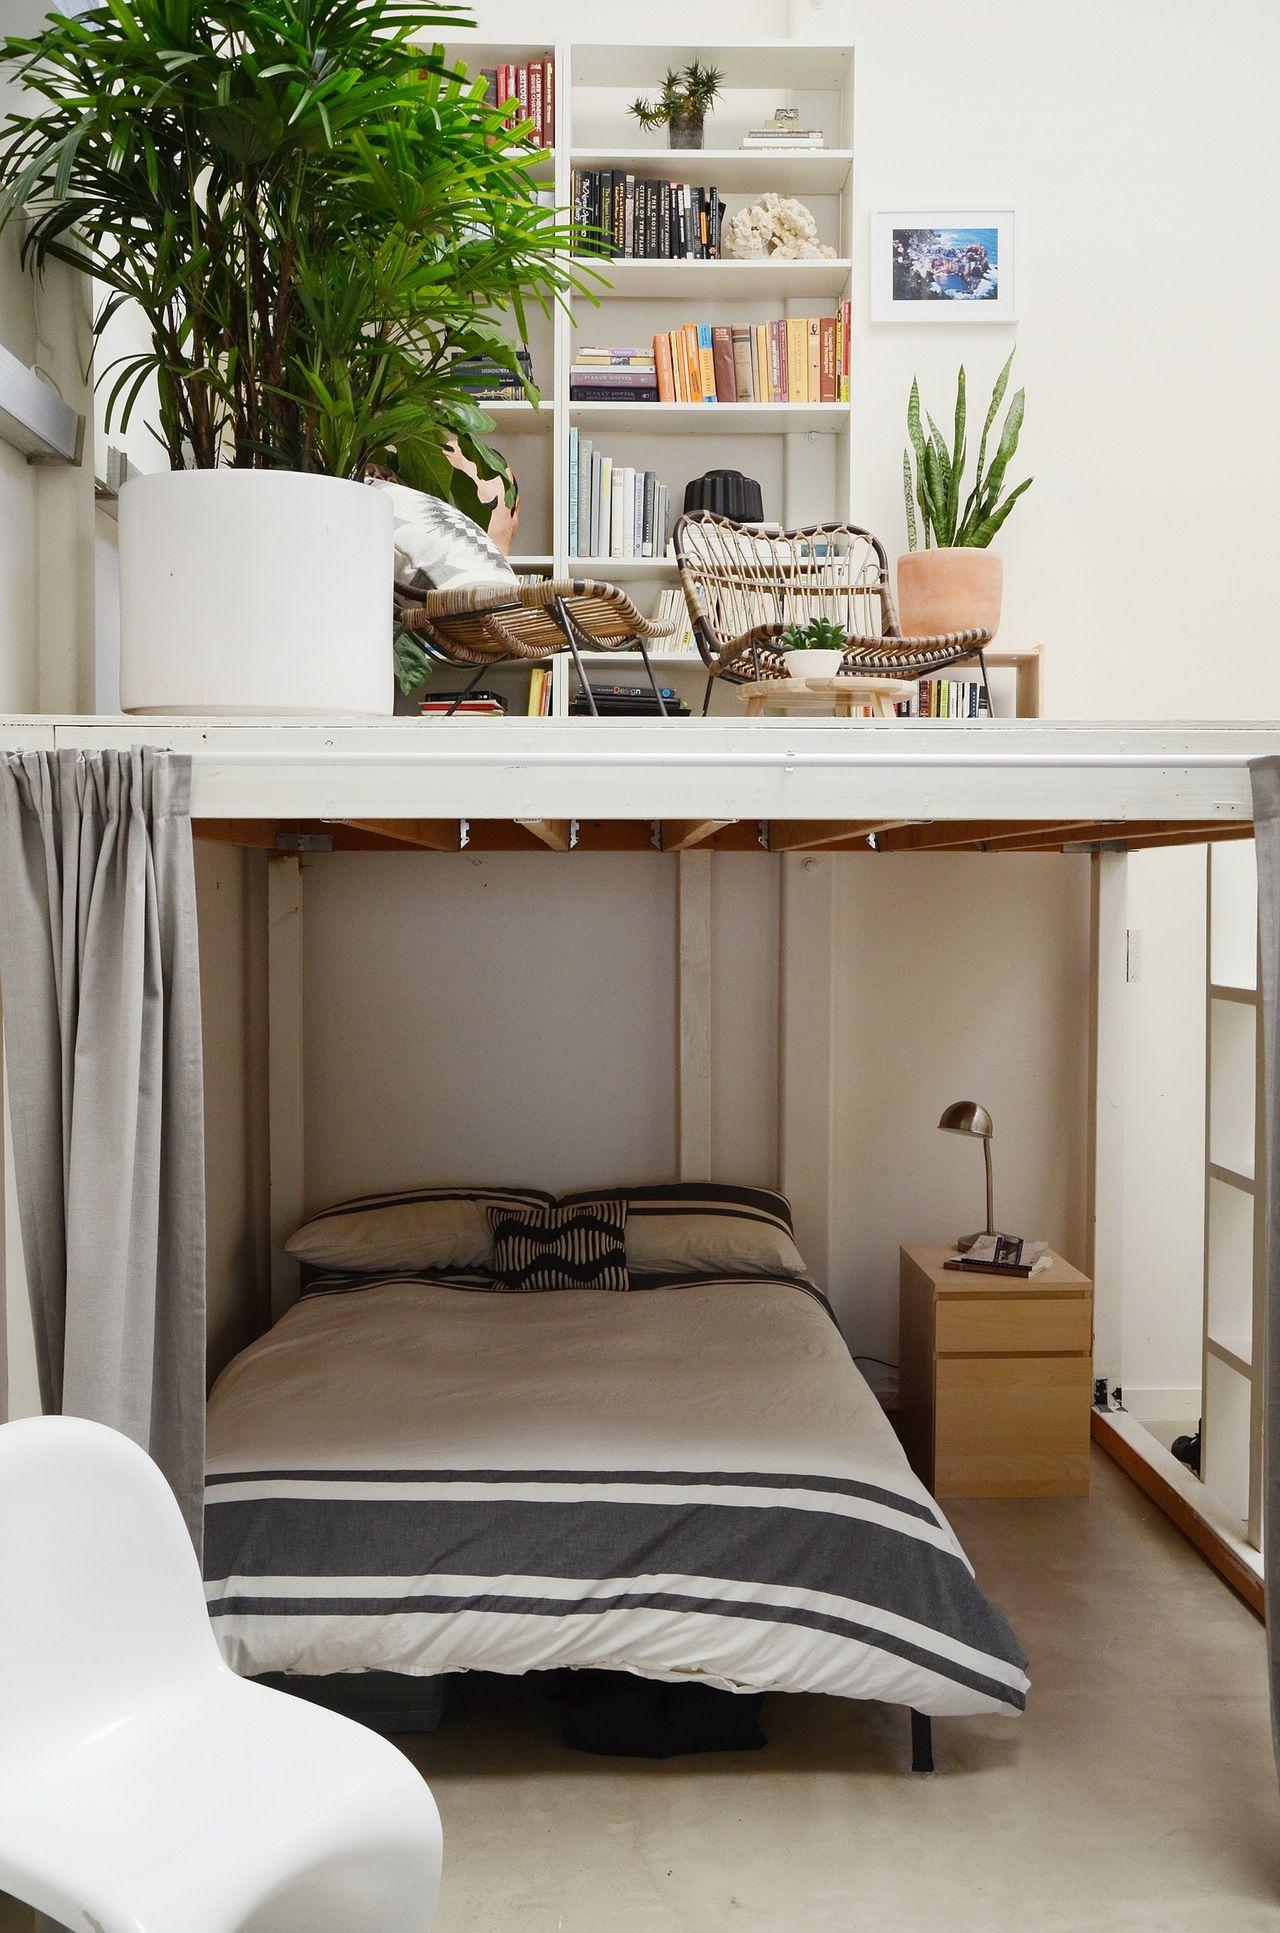 Photo of 3 Creatives Make It Work in an Open, Eclectic Modern Oakland Loft